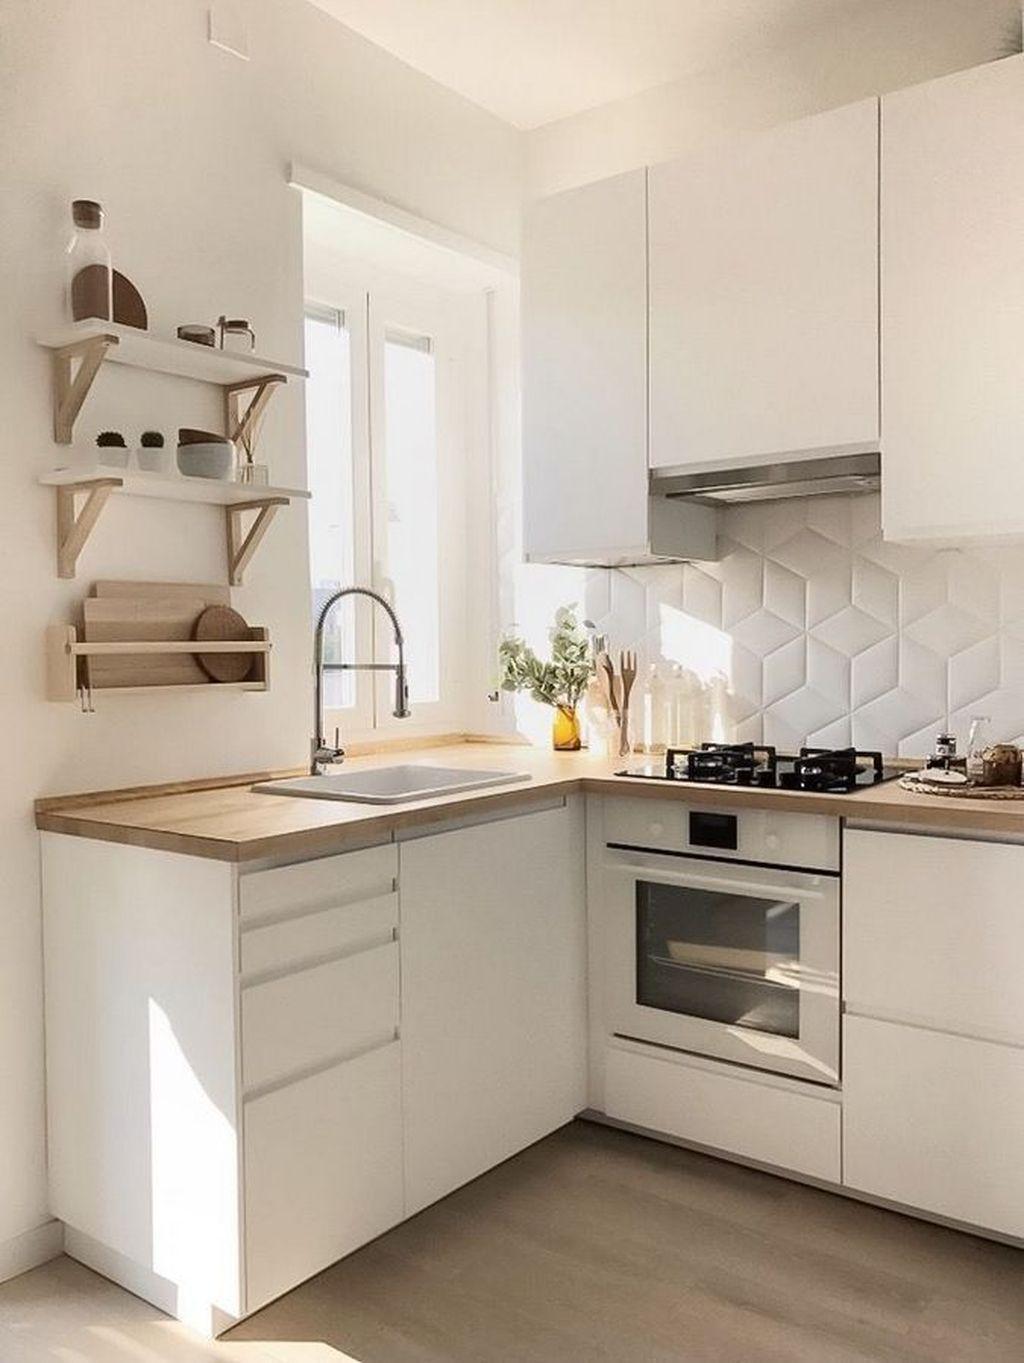 35 Amazing Small Apartment Kitchen Ideas Small Apartment Kitchen Kitchen Design Small Kitchen Interior